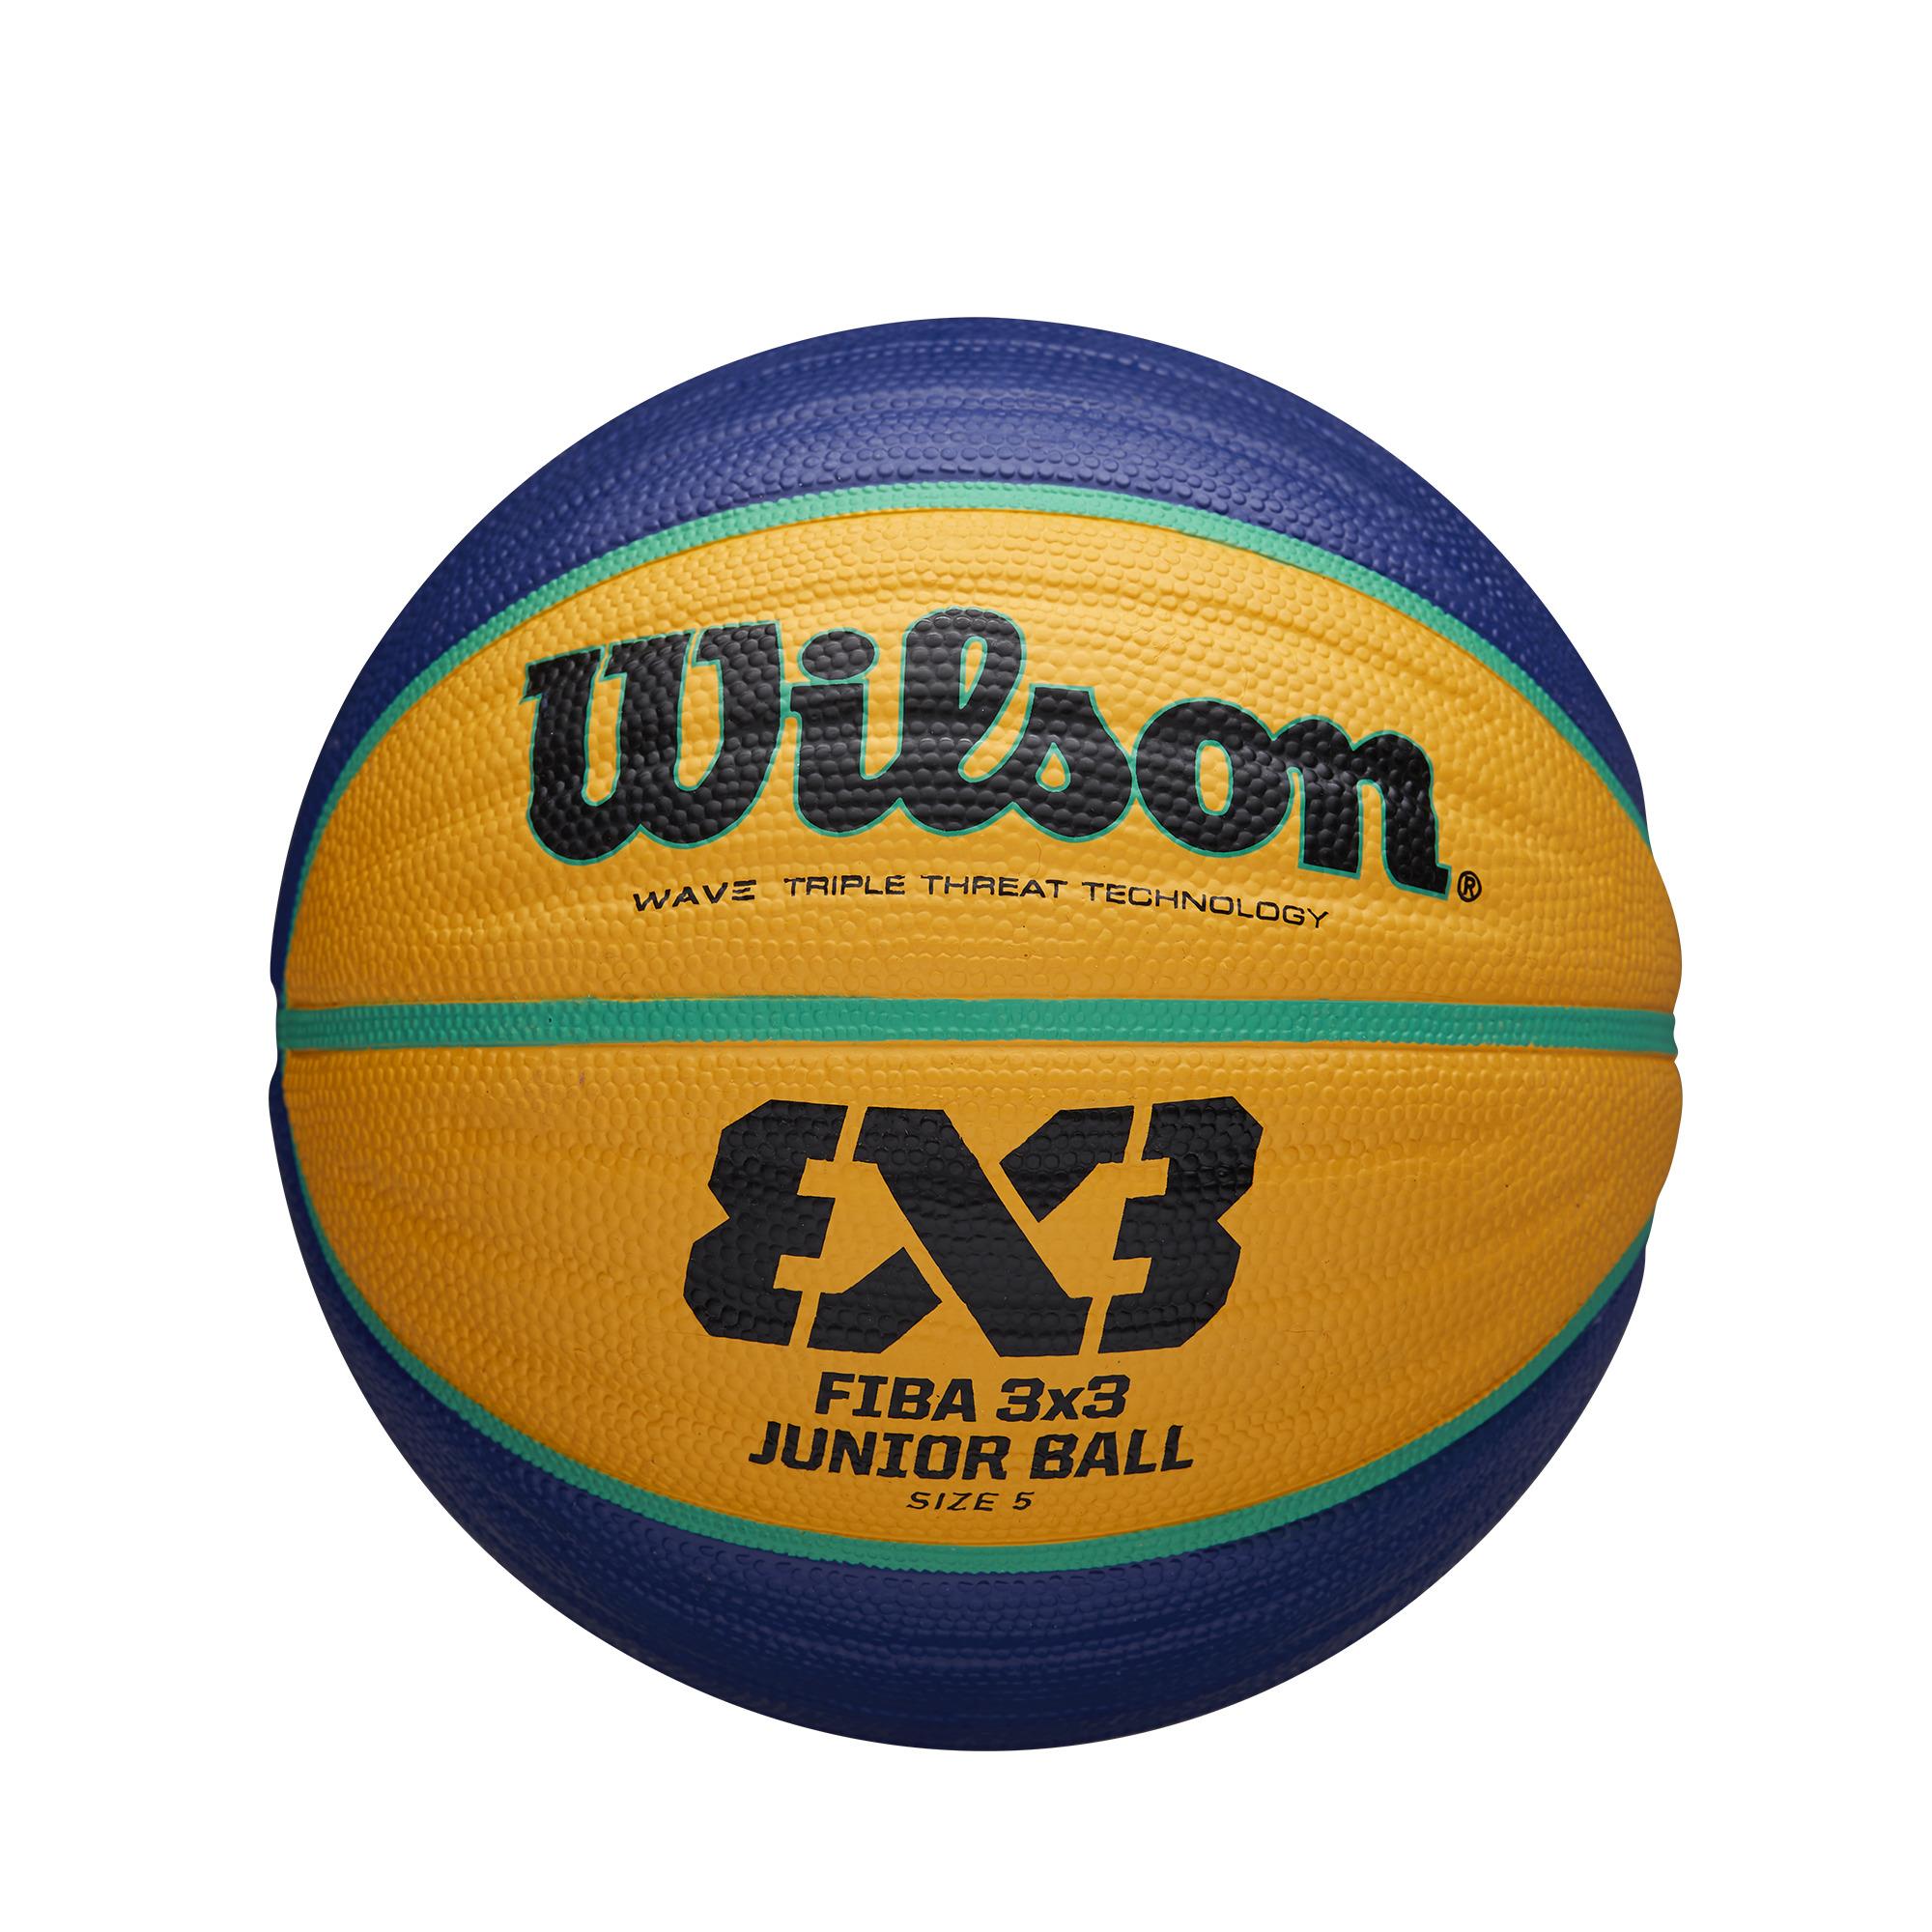 WILSON basketbola bumba FIBA 3X3 JUNIOR REPLICA bumba